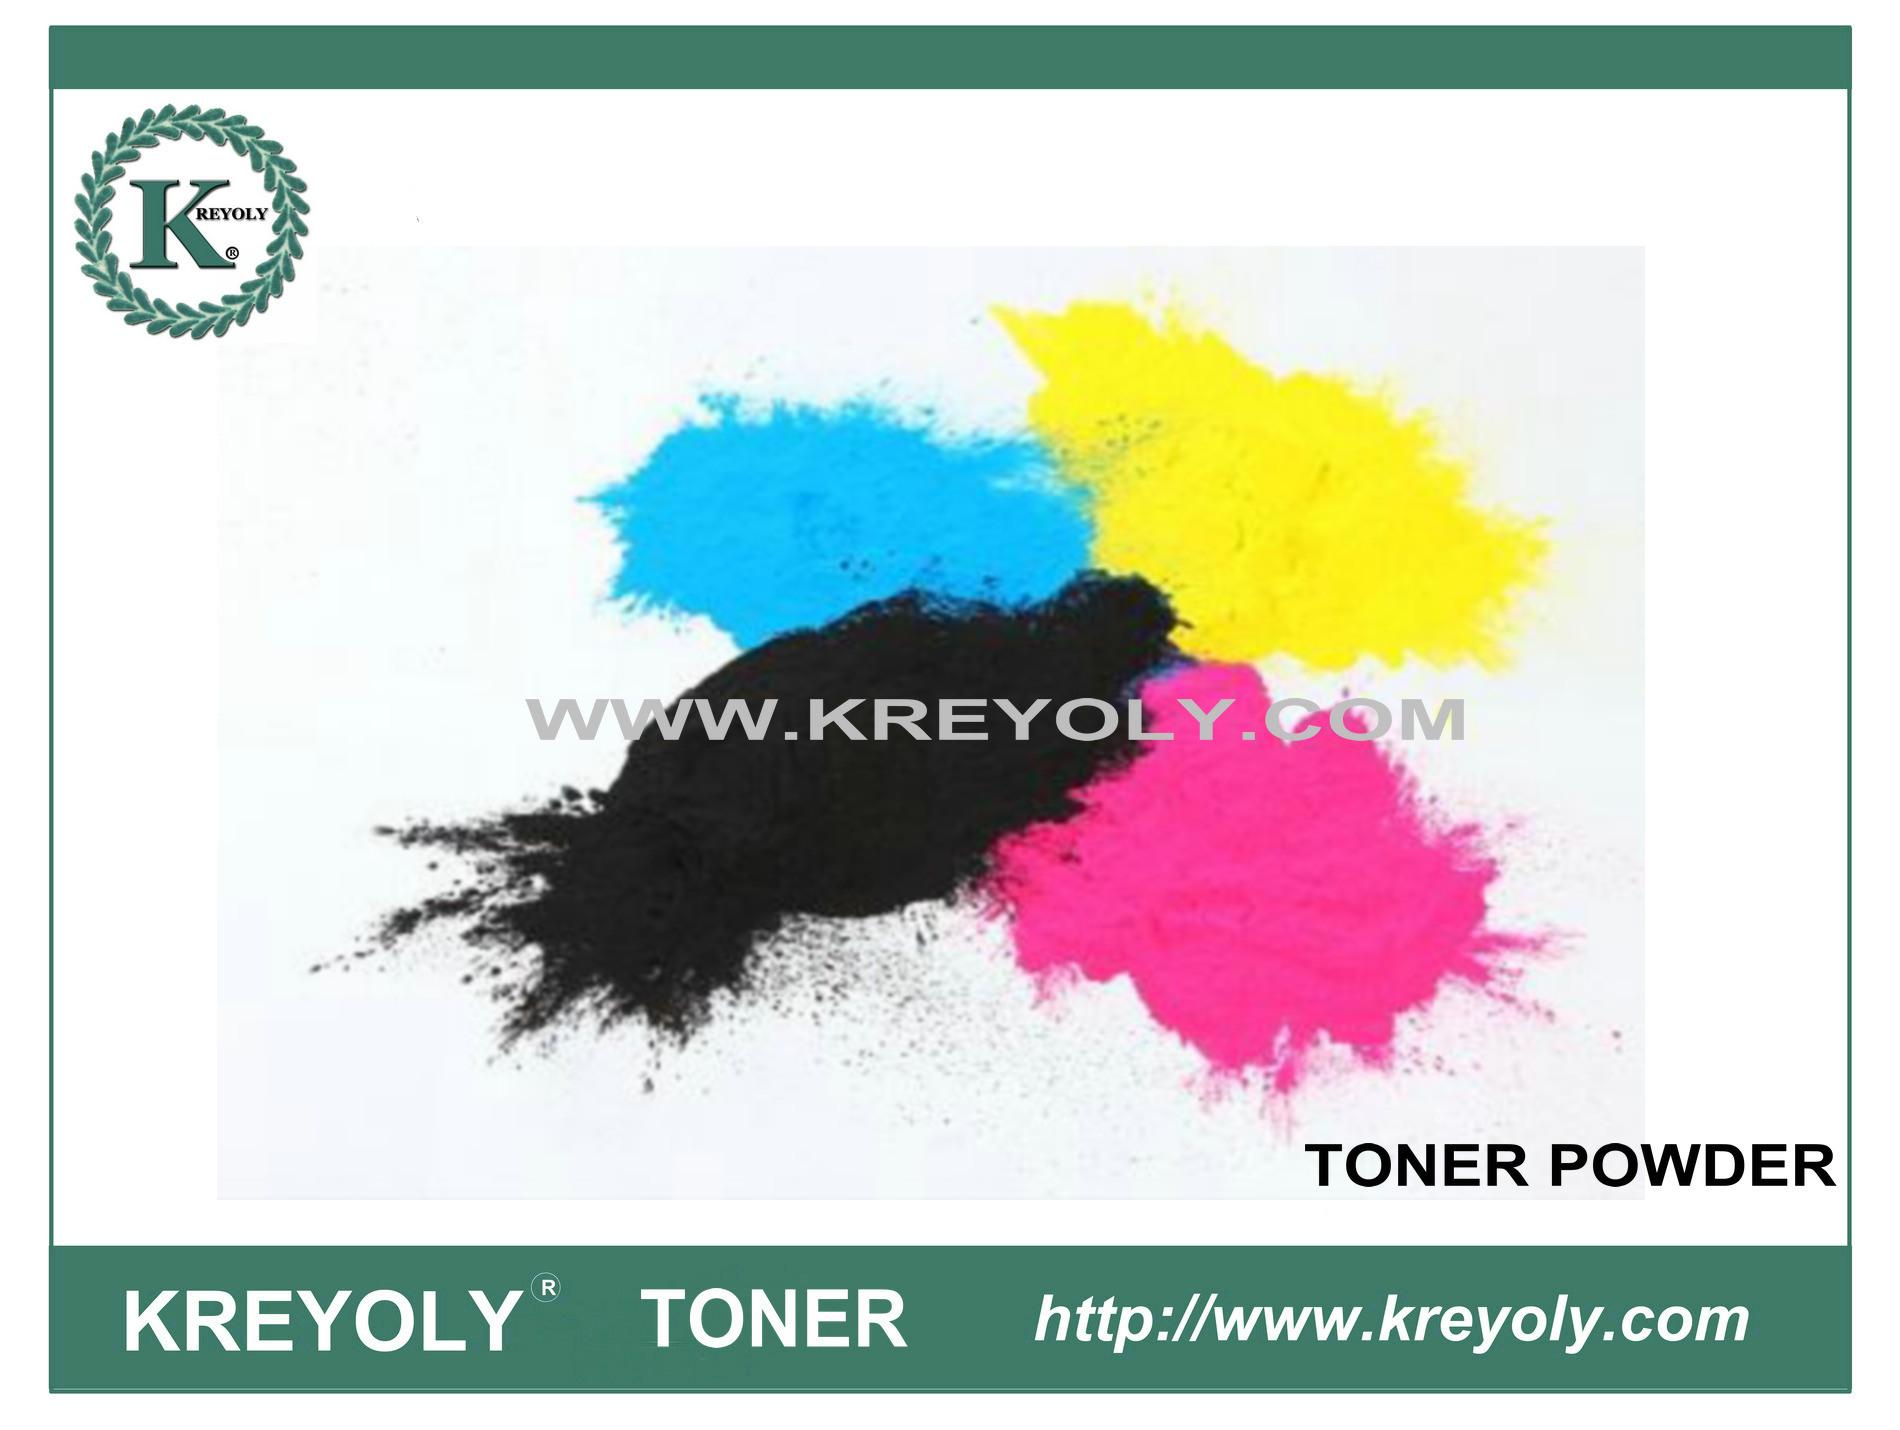 Compatible Toner Powder for Canon IR-1600/2000 (NPG-20, GPR-8, C-EXV-5)